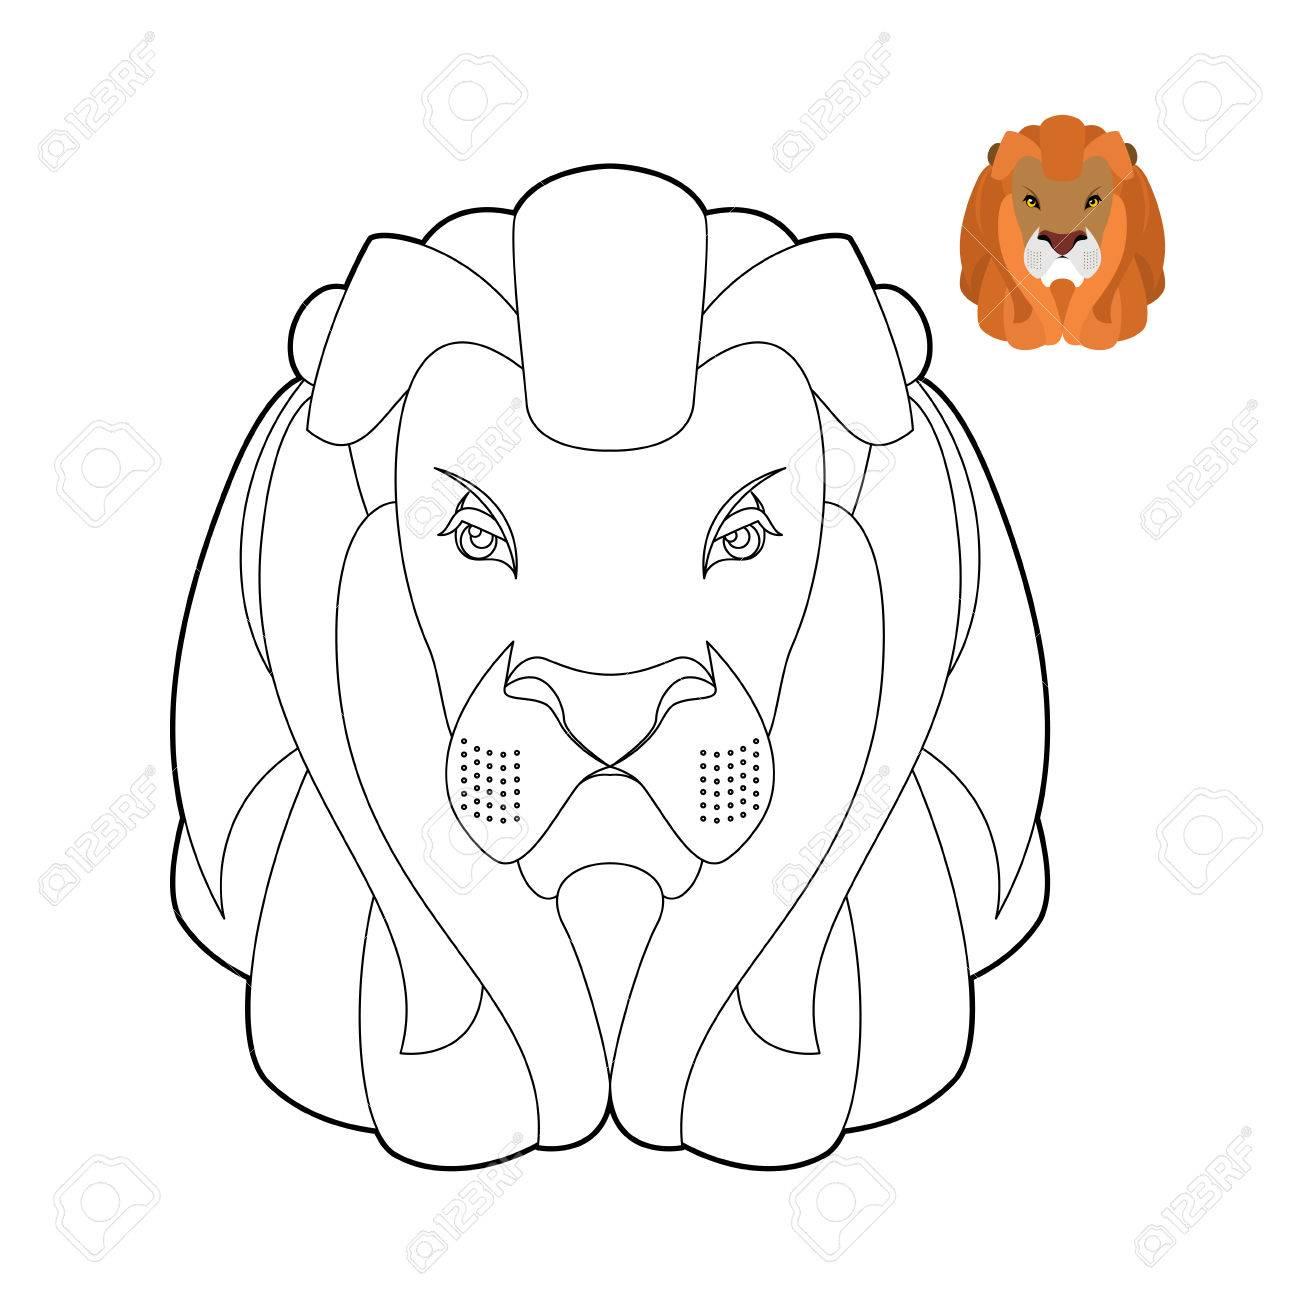 1300x1300 Lion Coloring Book. Head Of Predator With Shaggy Mane. Wild Cruel